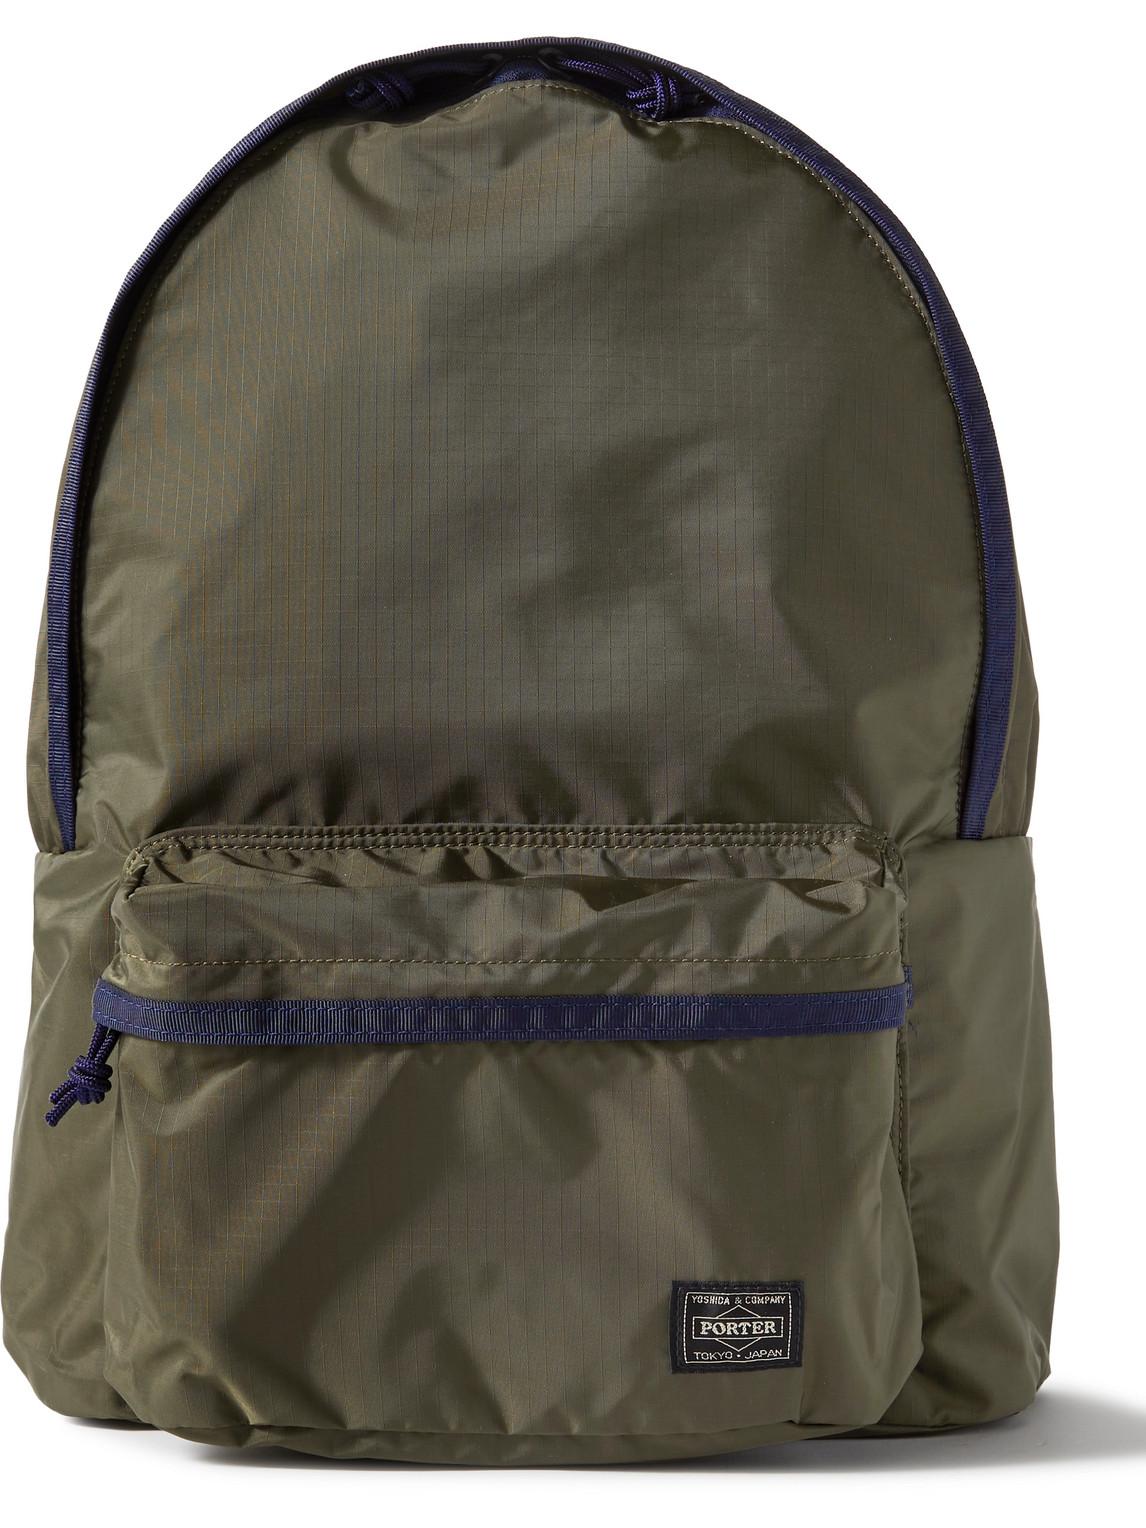 Porter, Yoshida & Co Jungle Nylon-ripstop Backpack In Green